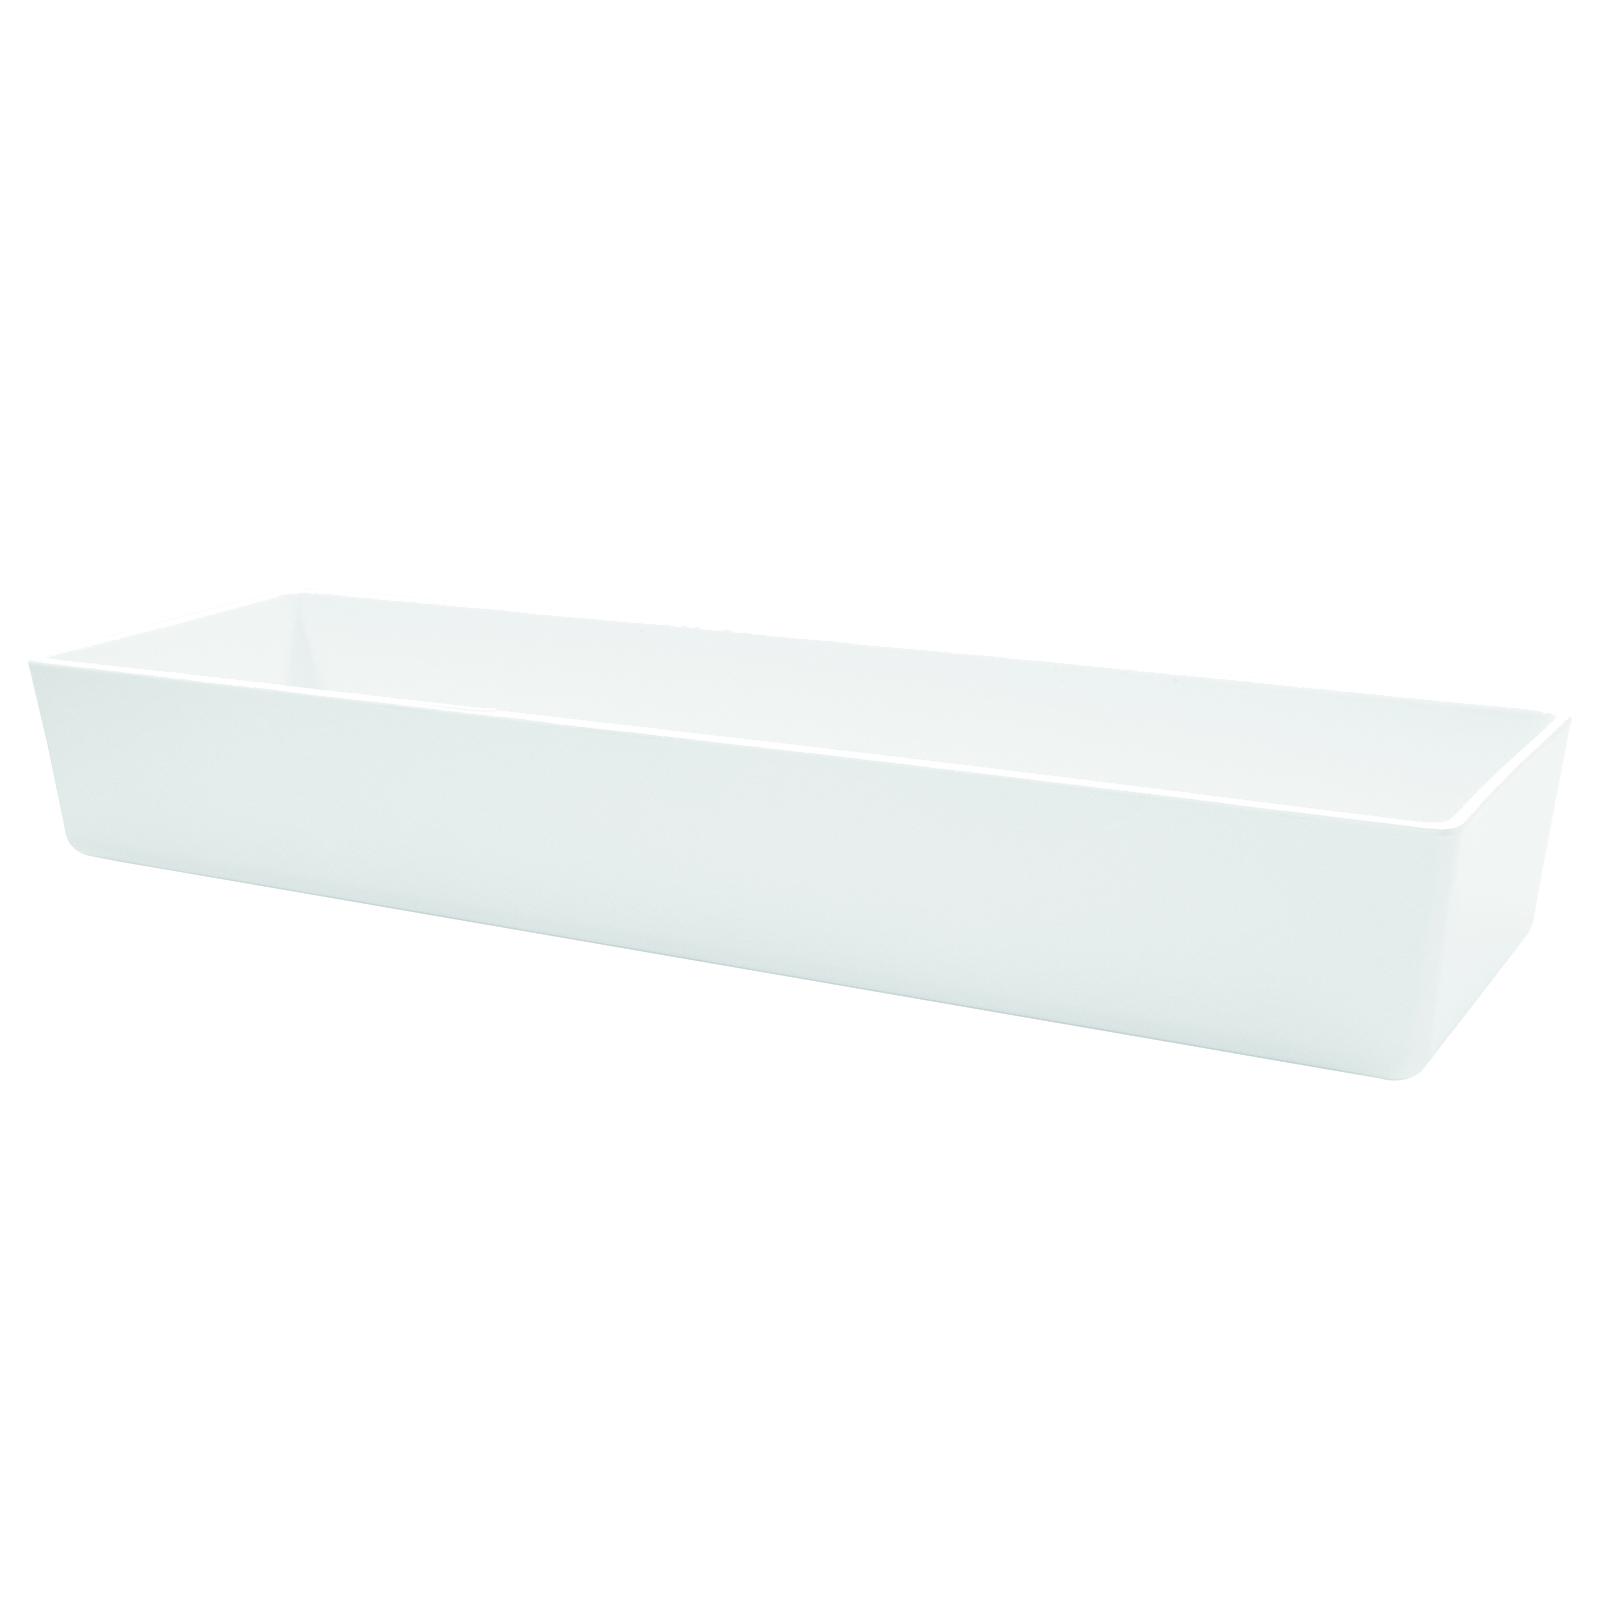 TableCraft Products M4017WH bowl, plastic,  5 - 6 qt (160 - 223 oz)